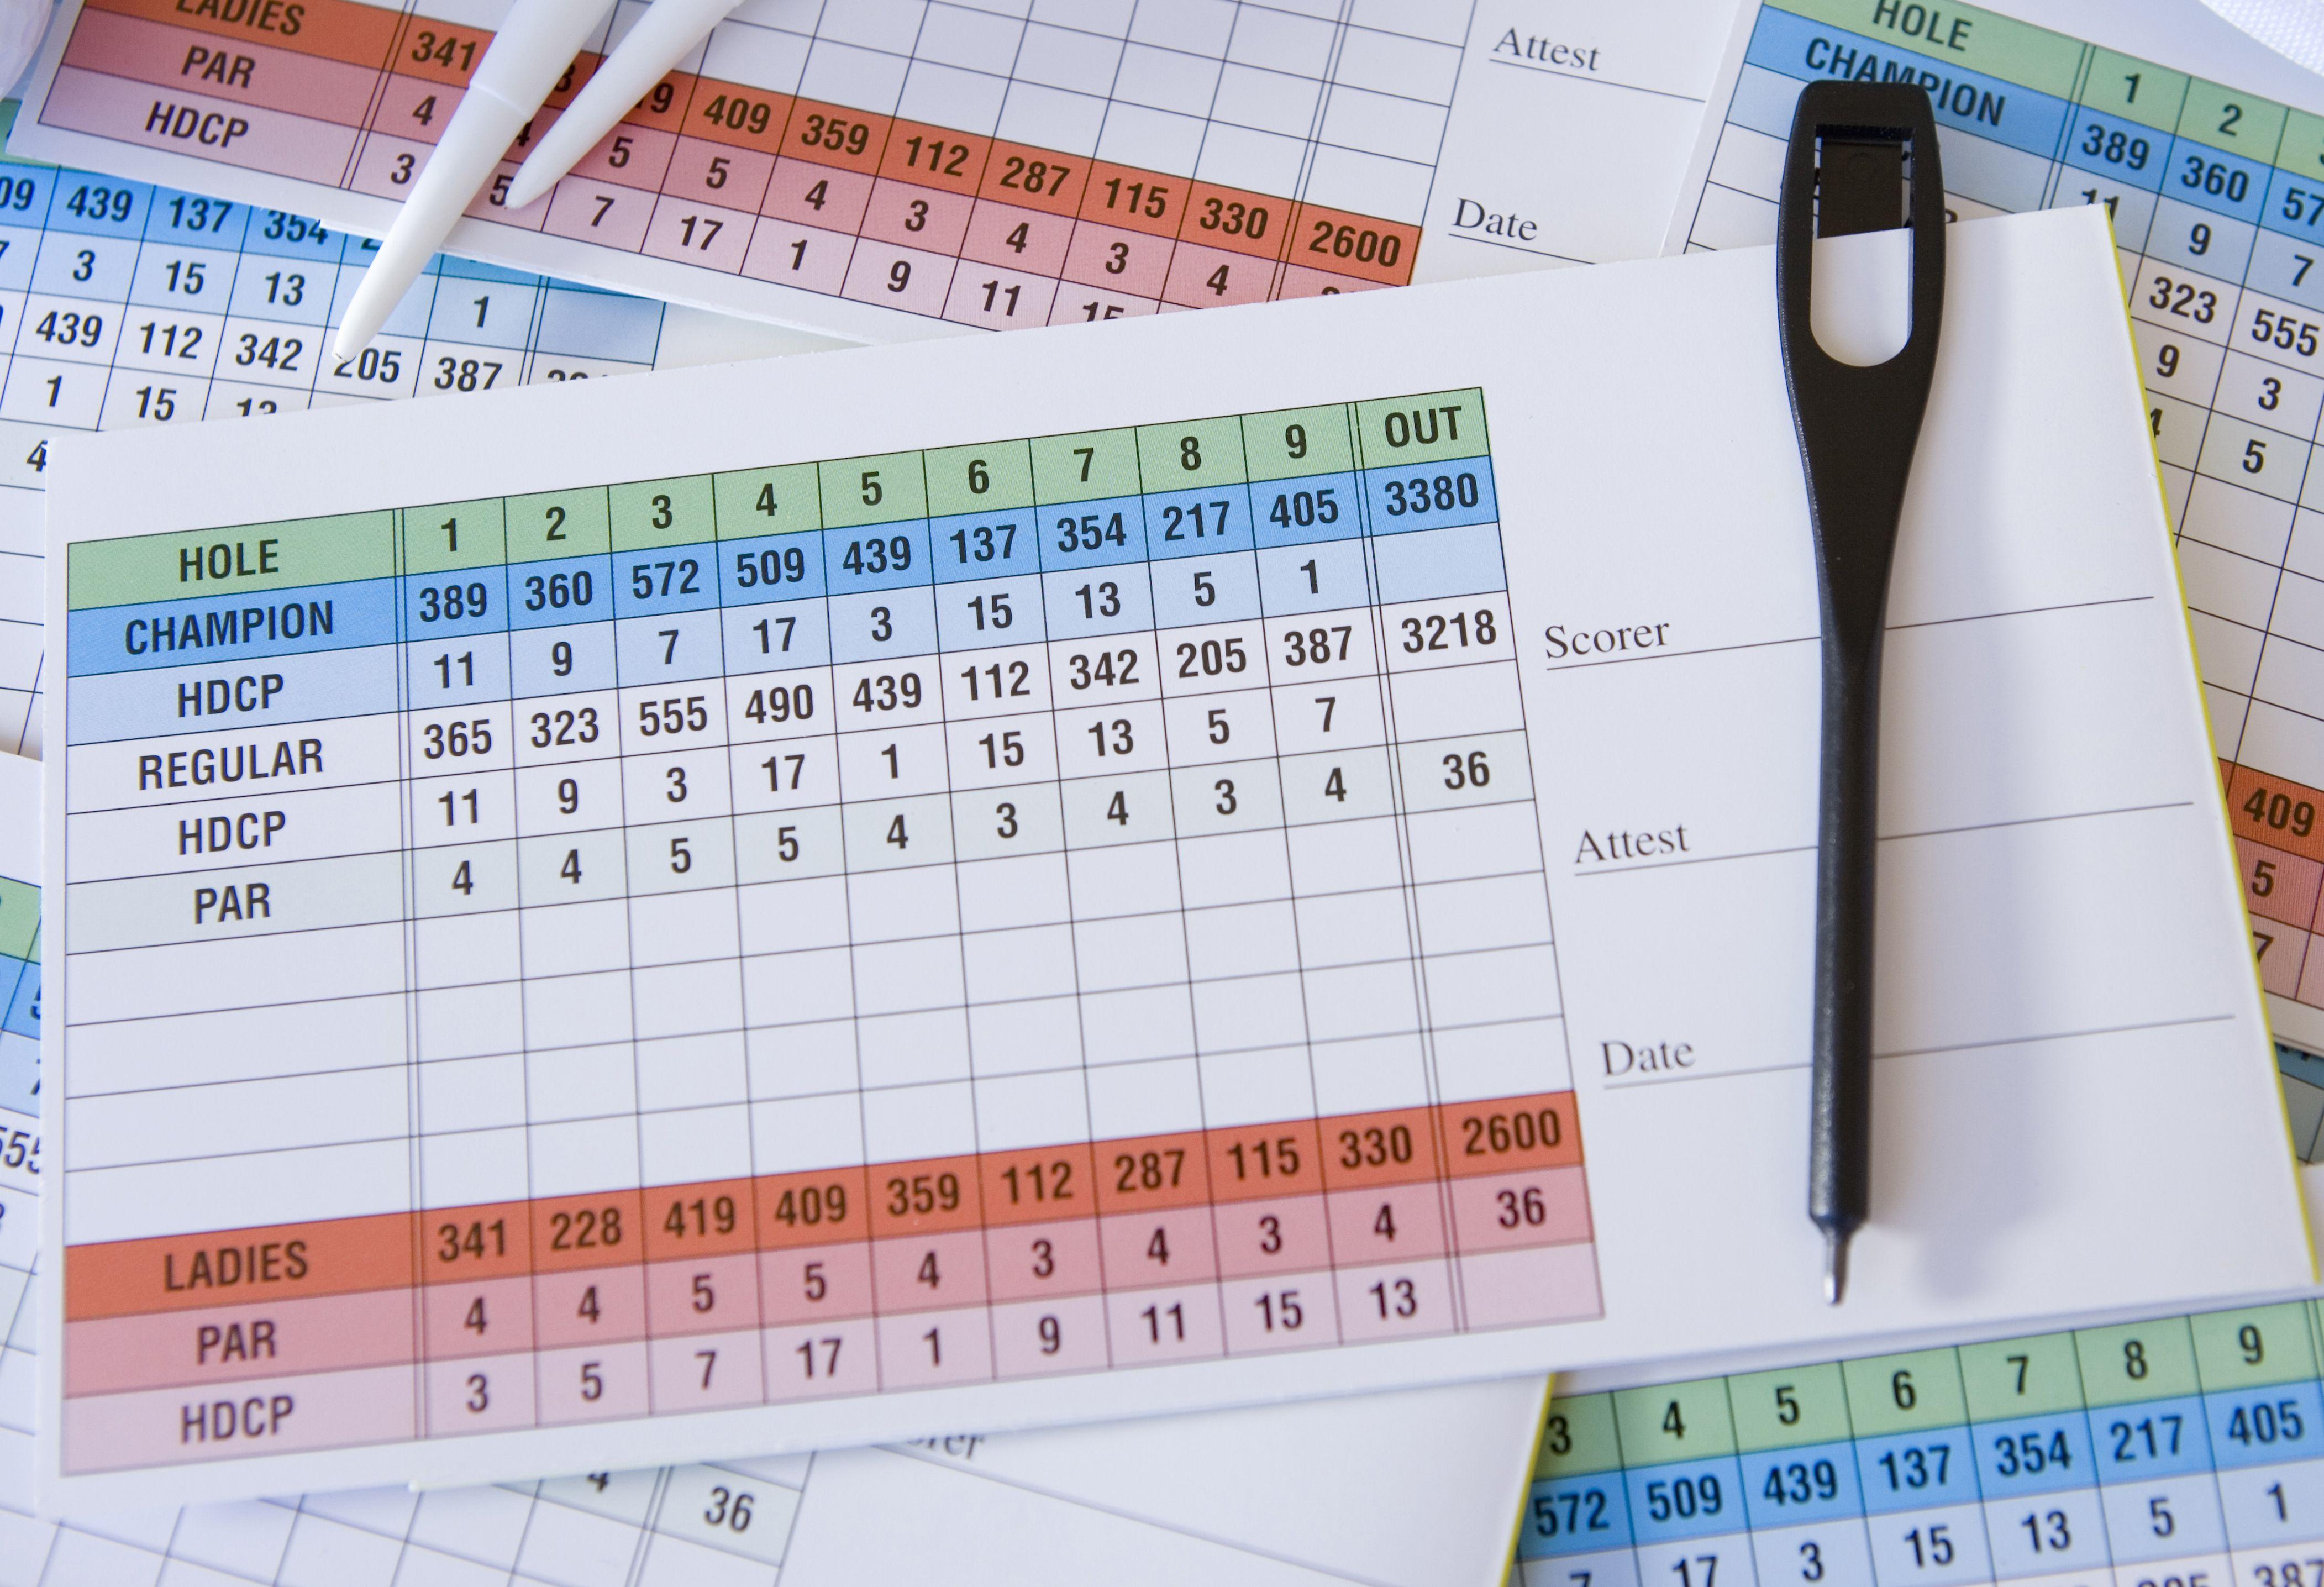 Photo of a golf scorecard